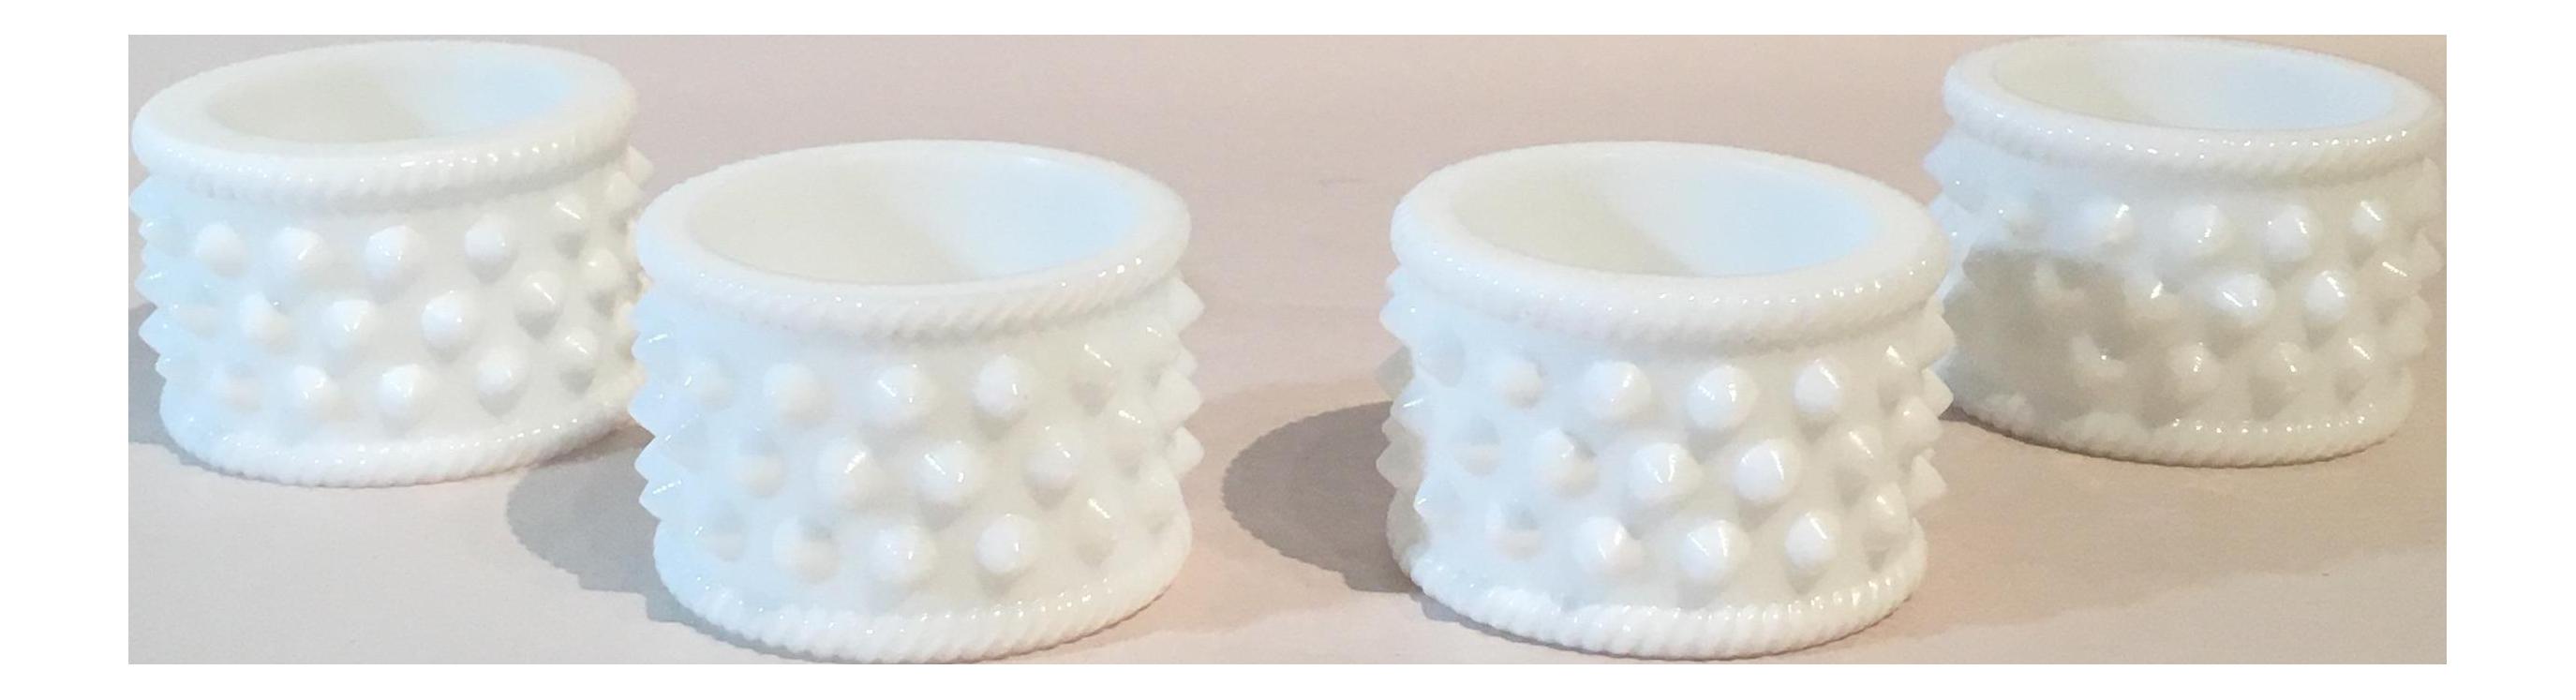 Fenton hobnail milk glass napkin rings set of 4 chairish reviewsmspy